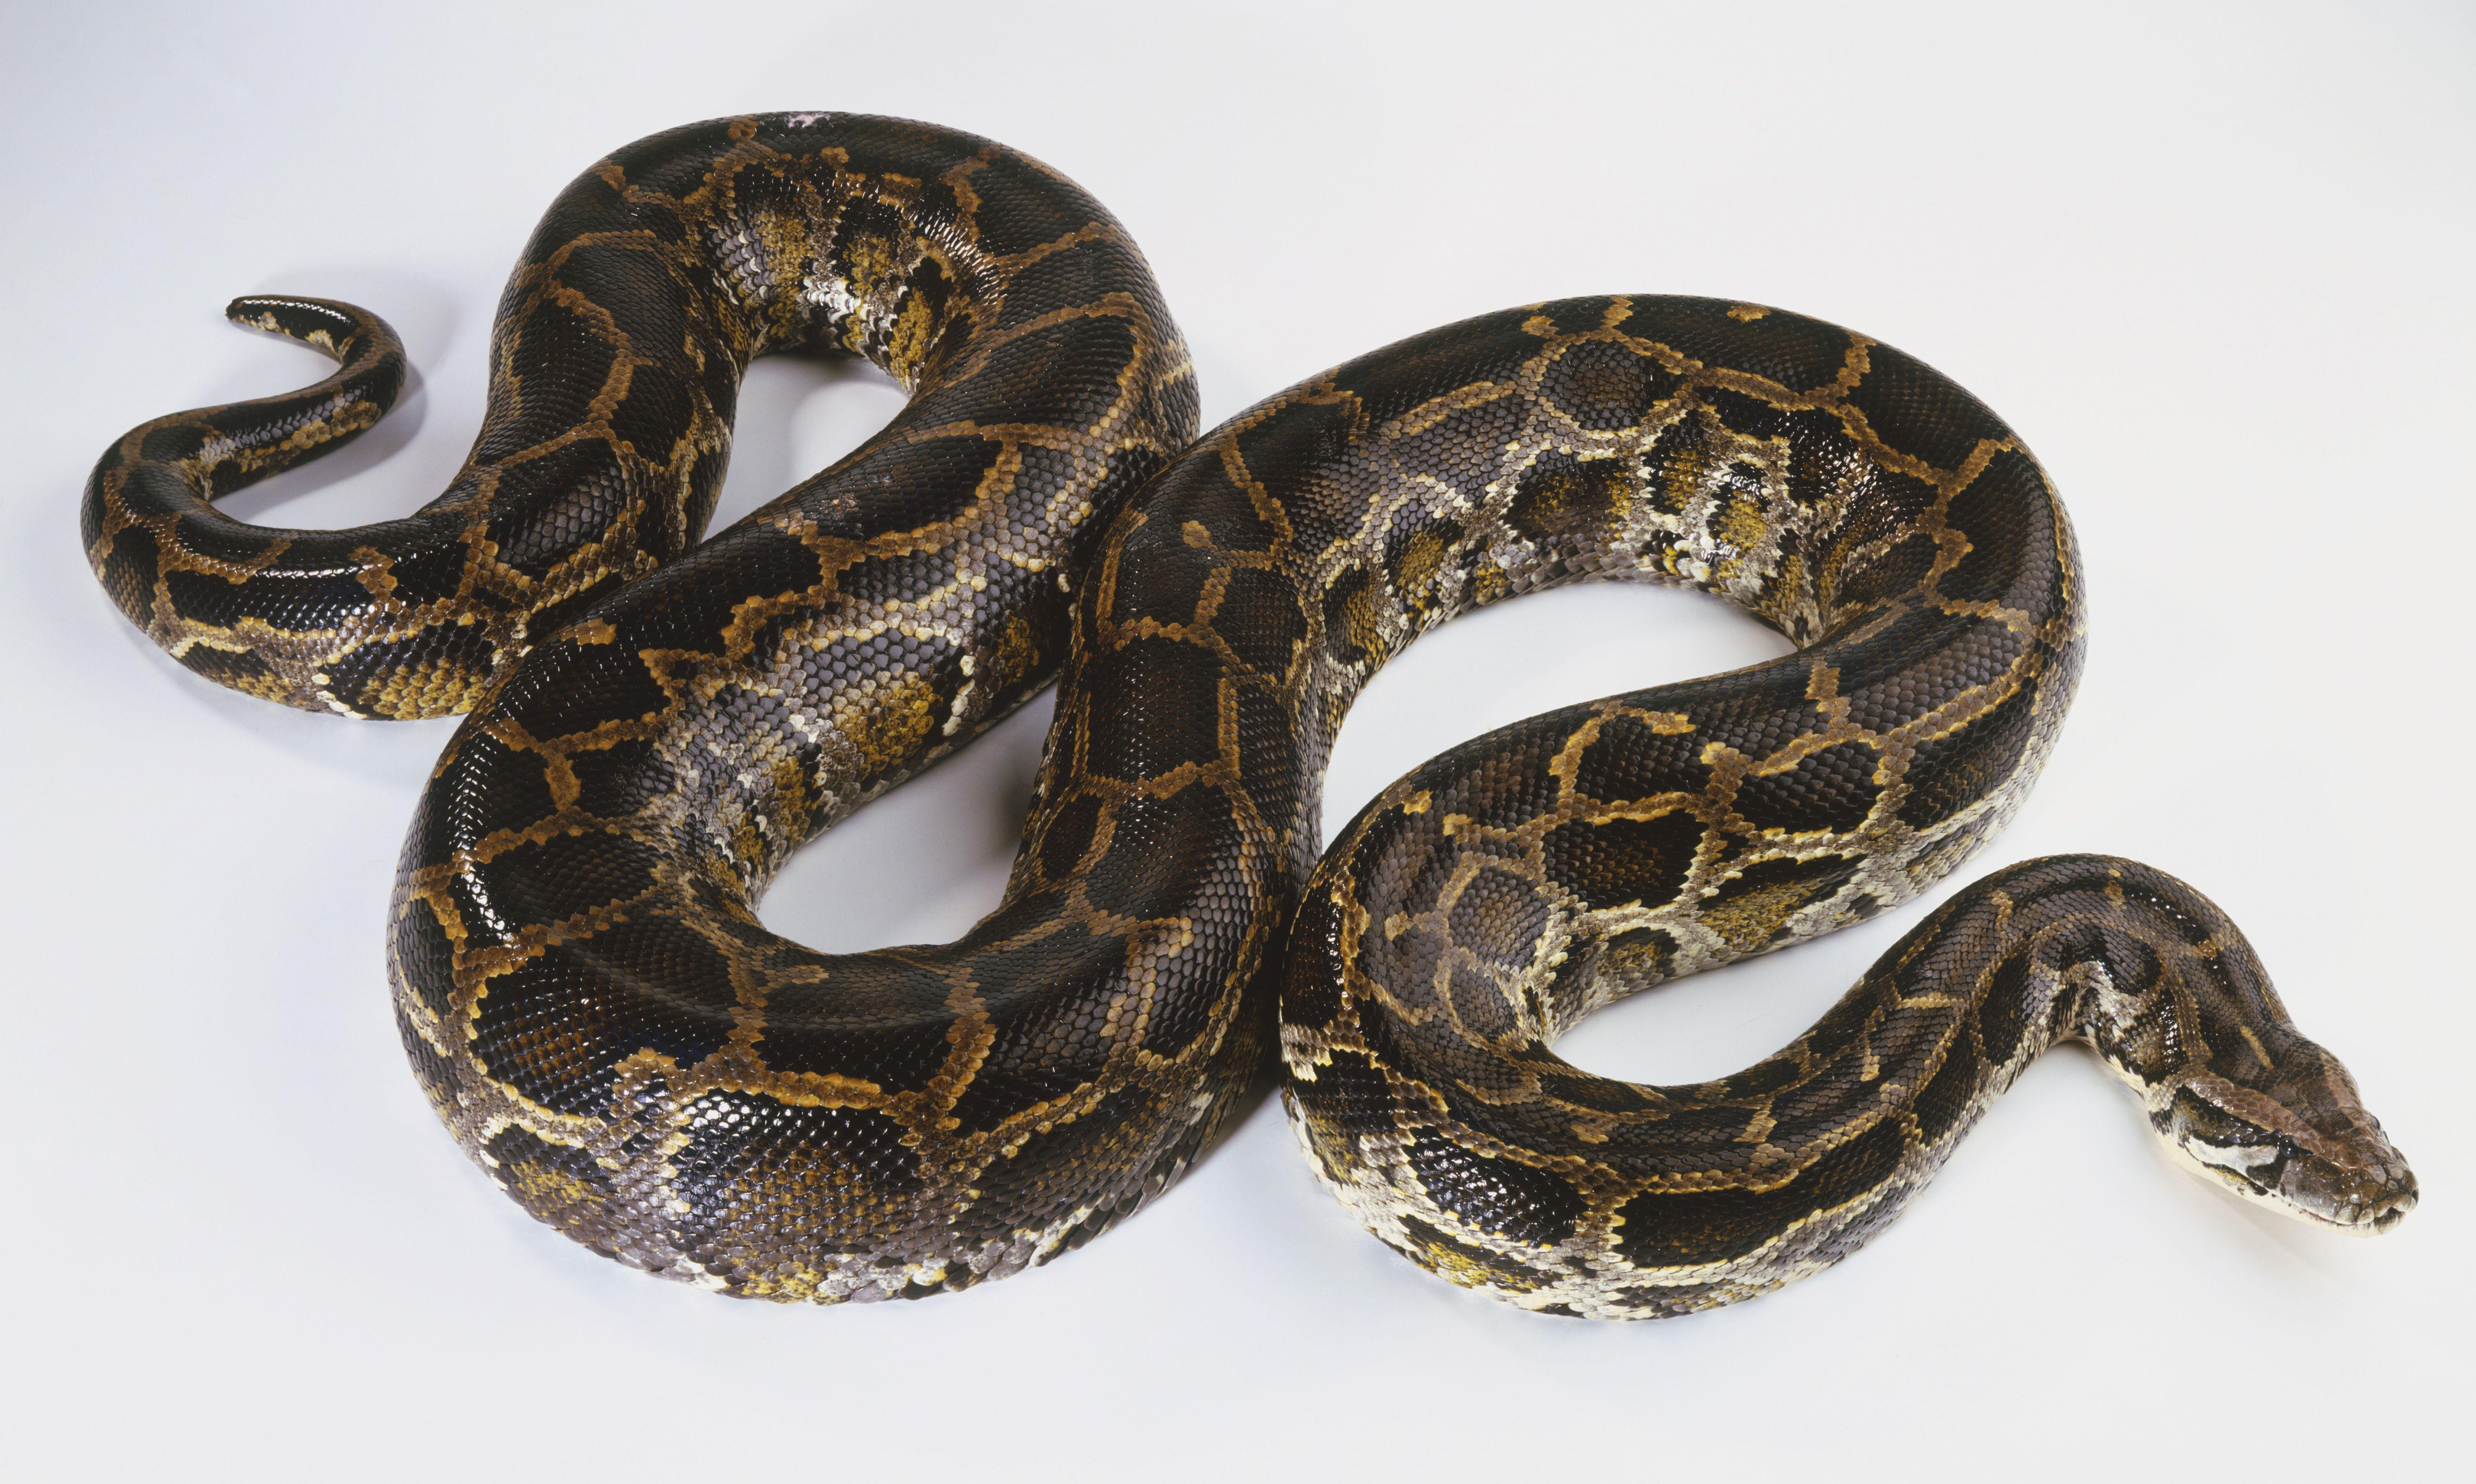 Python birmano deslizándose (Python molurus), vista desde arriba.